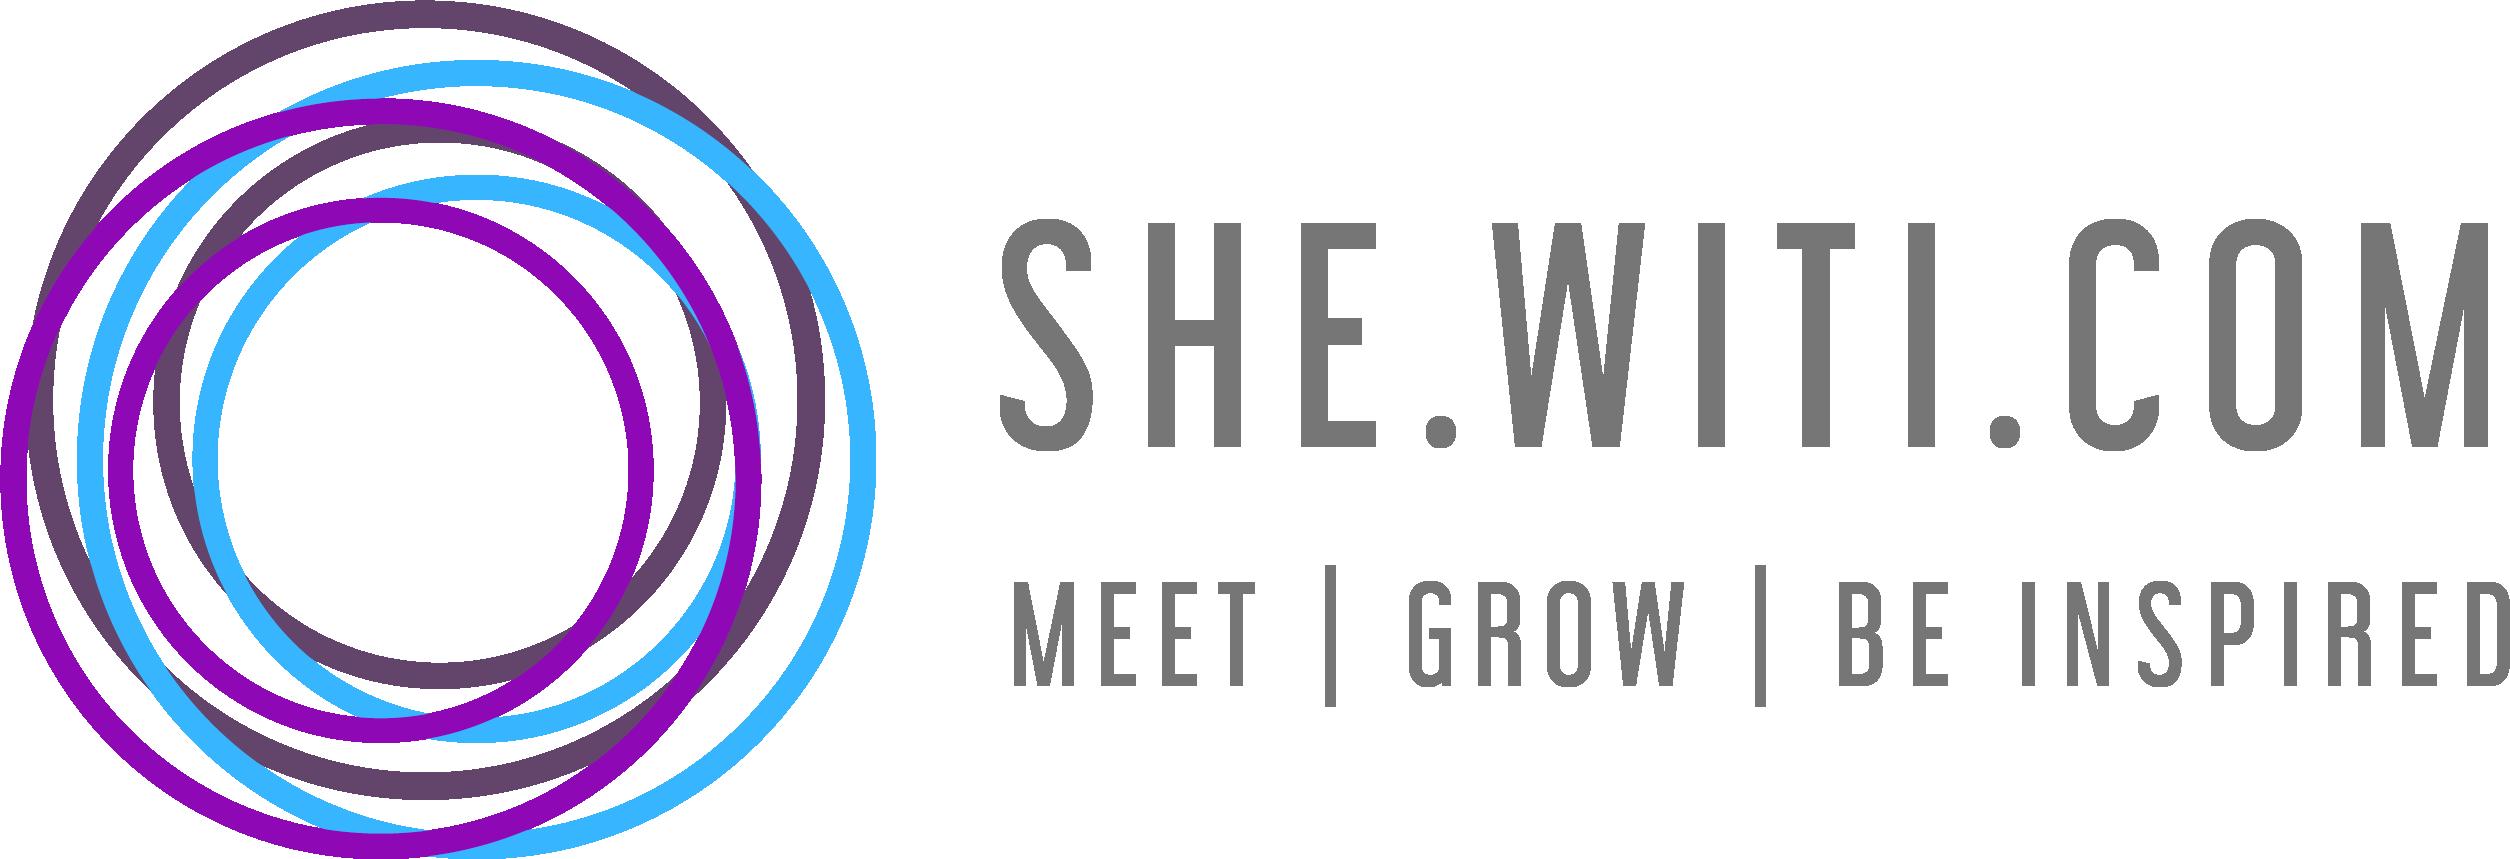 SHE.WITI.COM